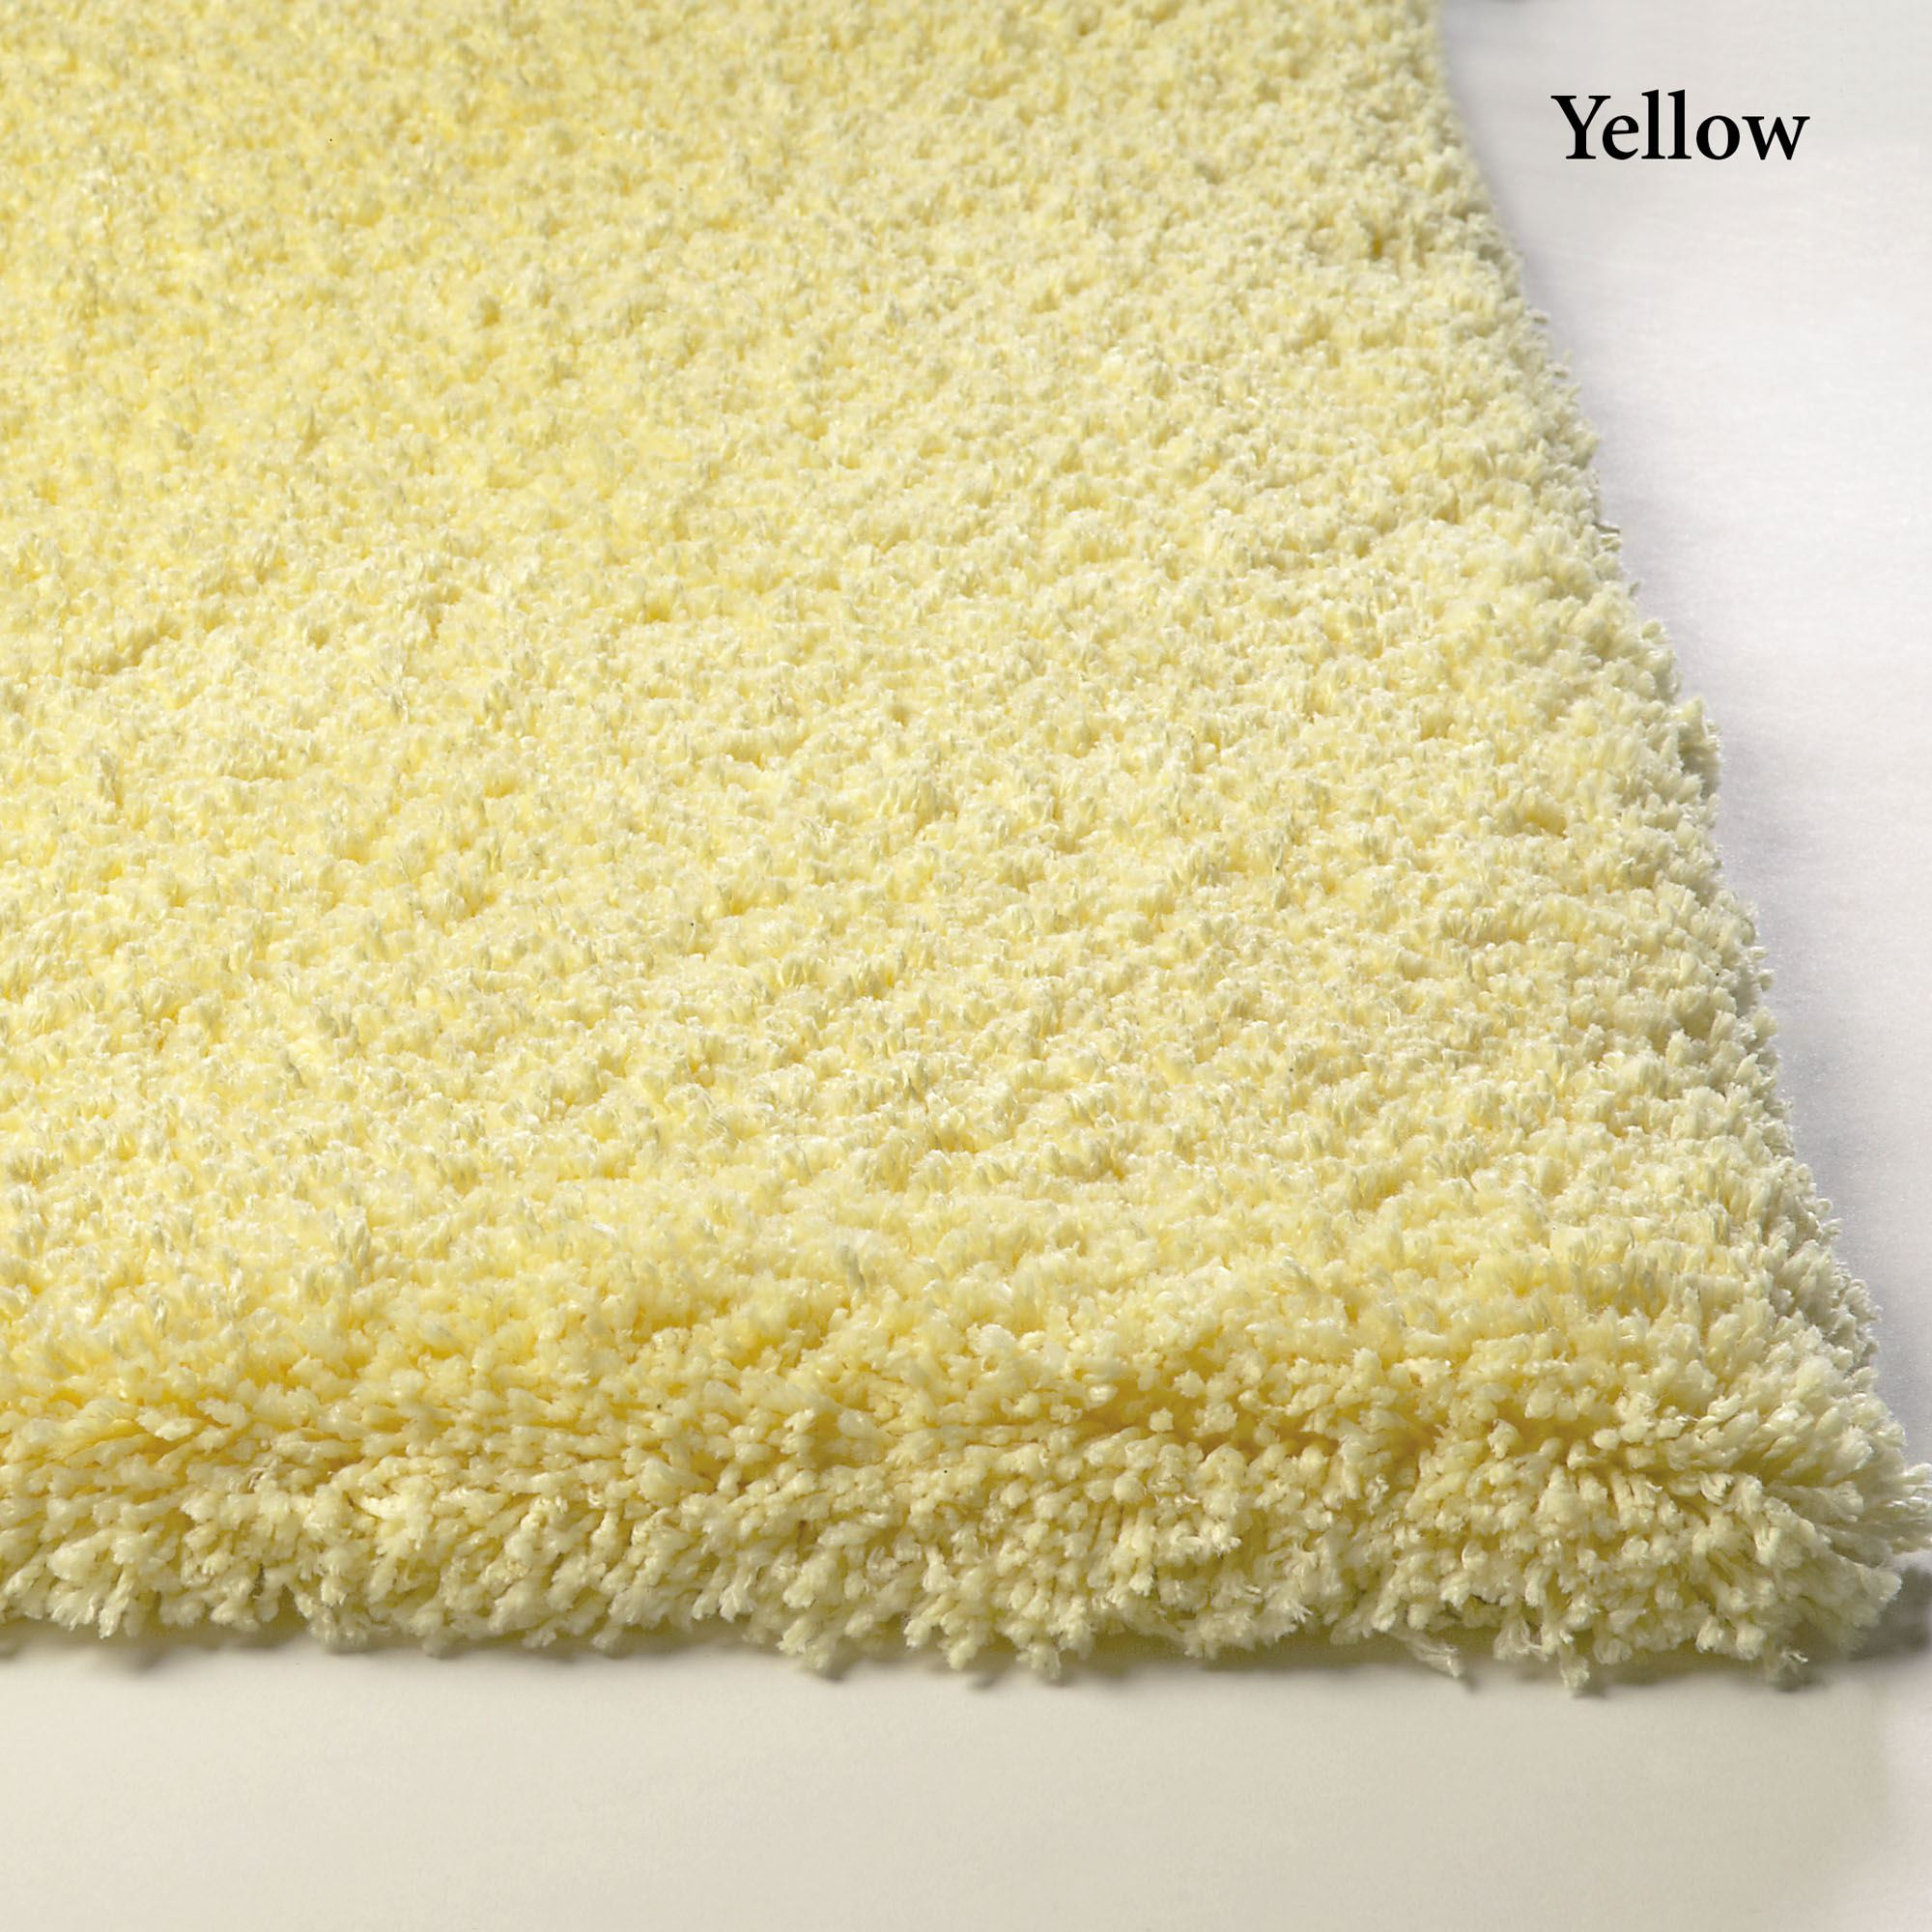 Fadfay Super Soft Modern Shaggy Area Rugs Turquoise Rug: Bliss Bright Super Soft Shag Area Rugs